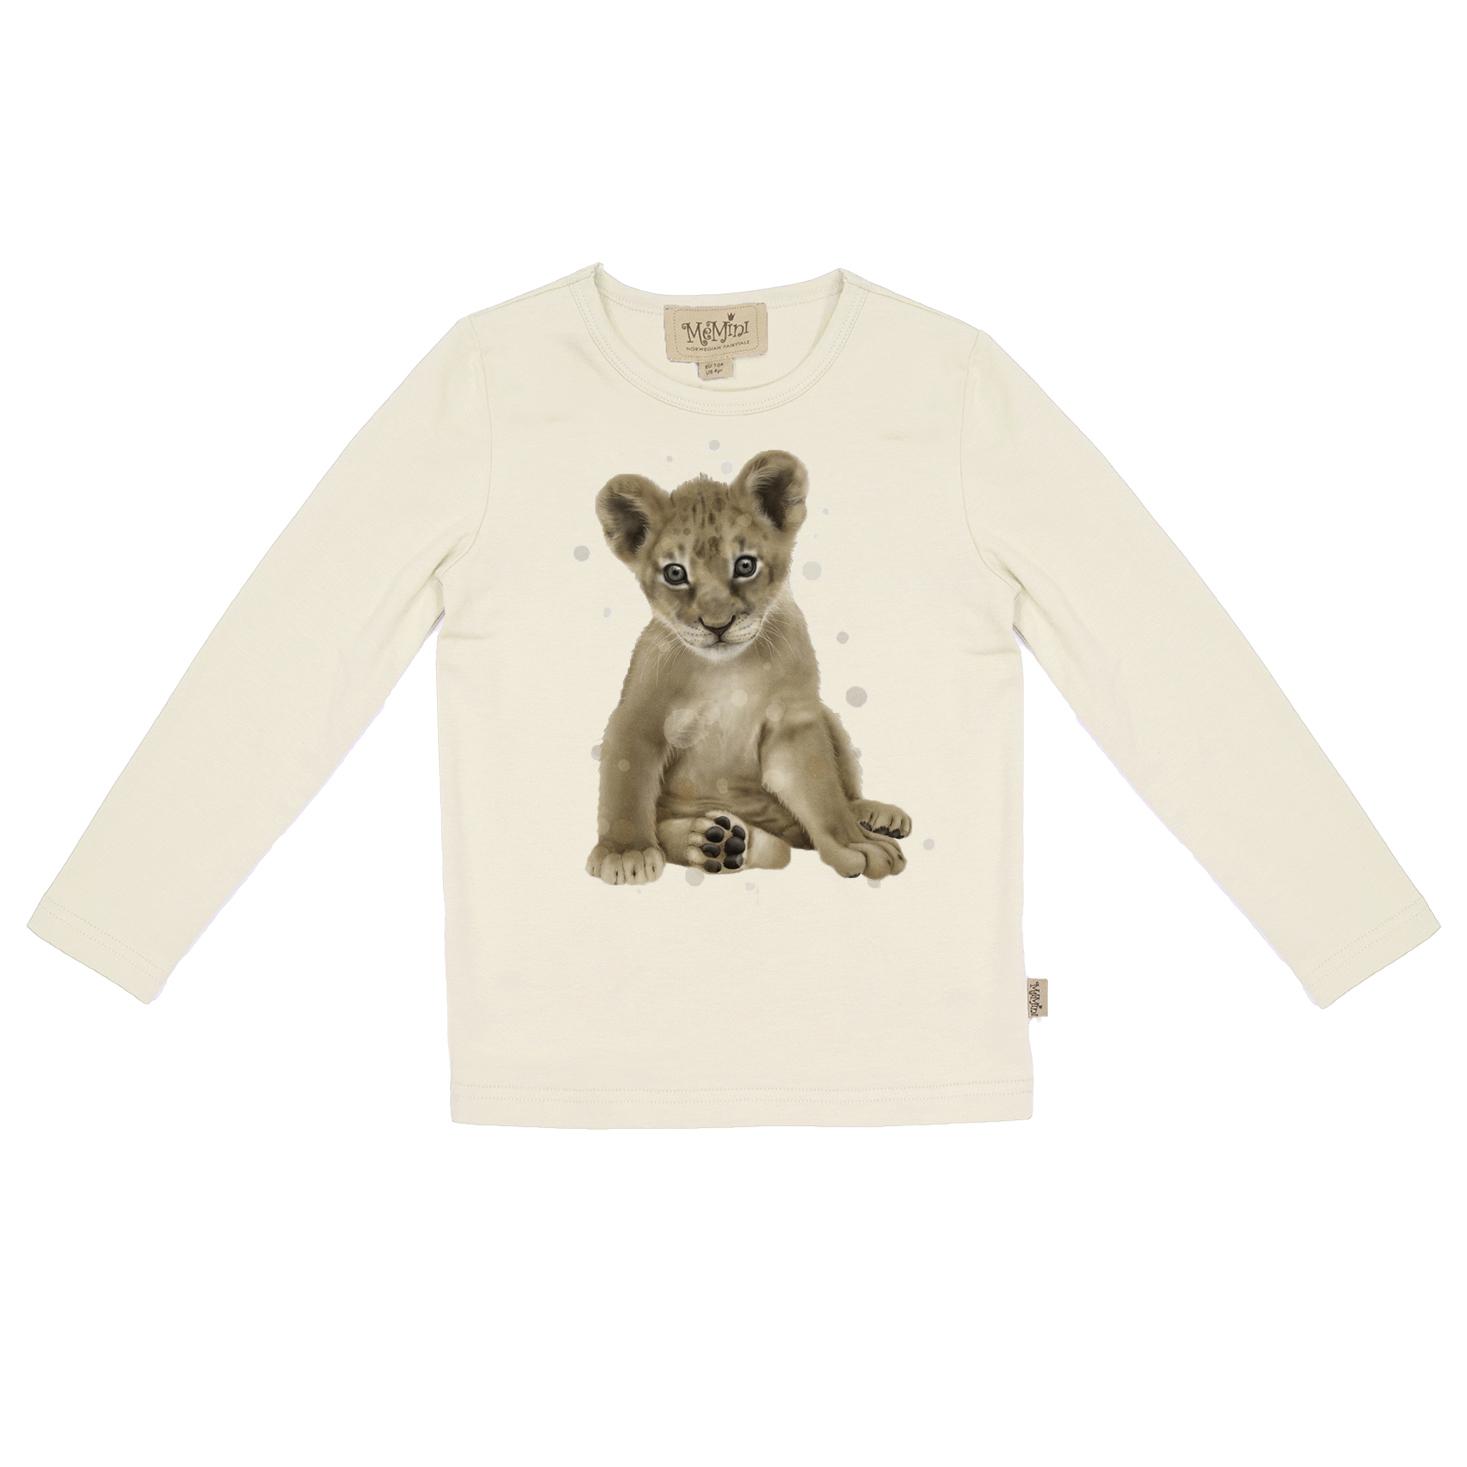 Memini genser løve